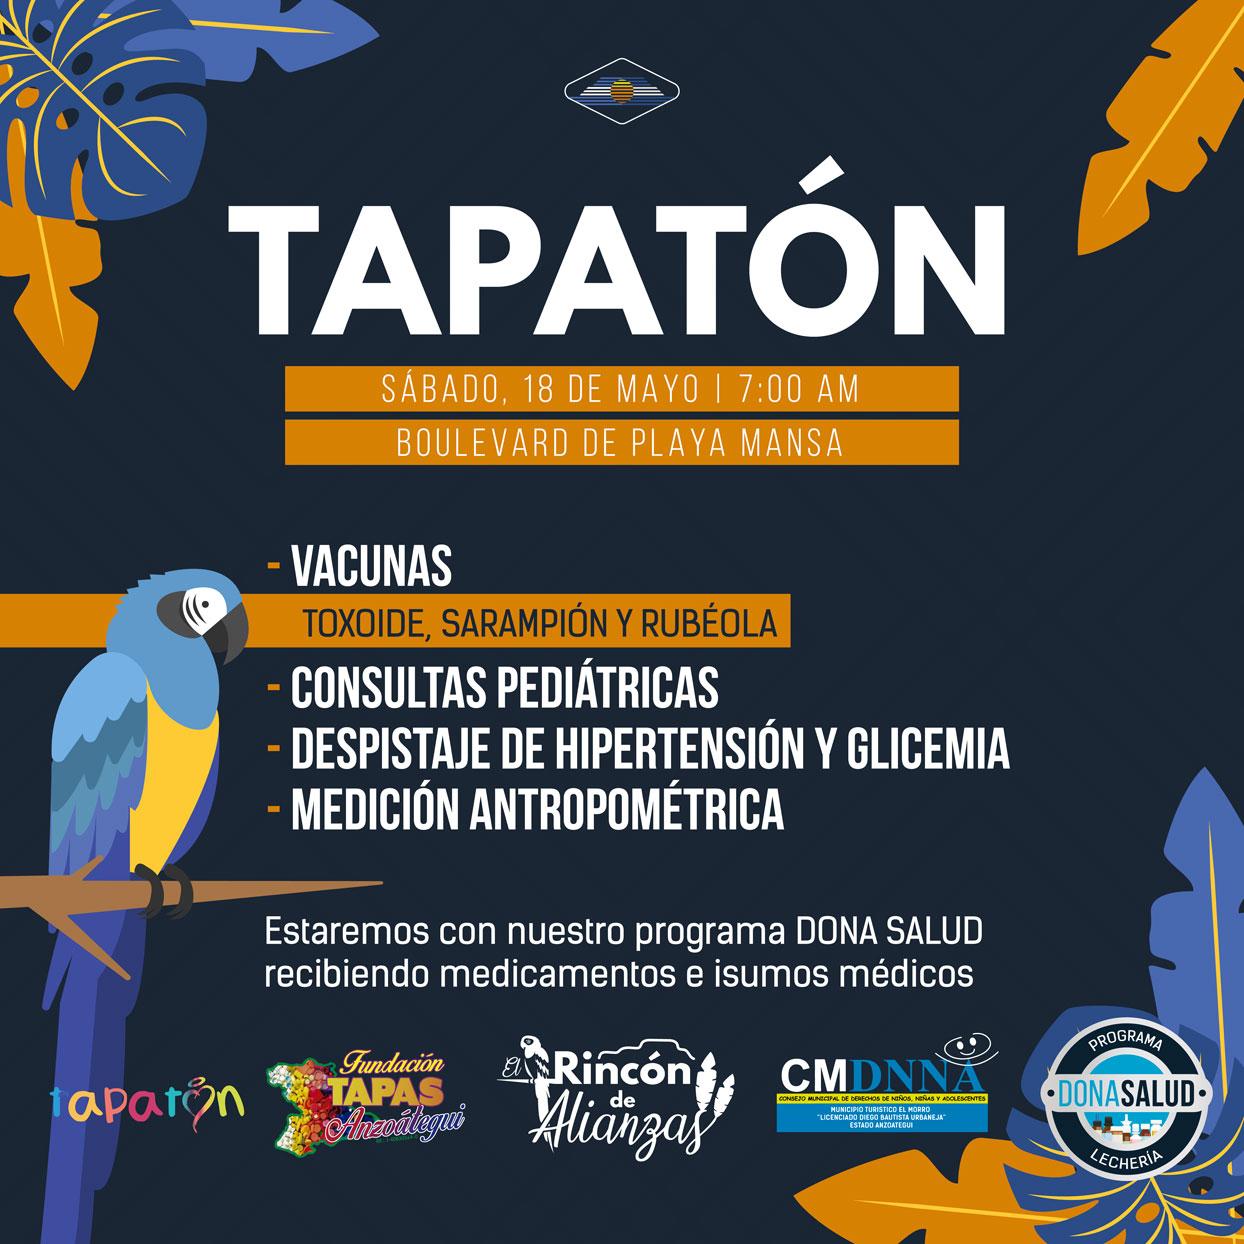 TAPATON-1244.jpg